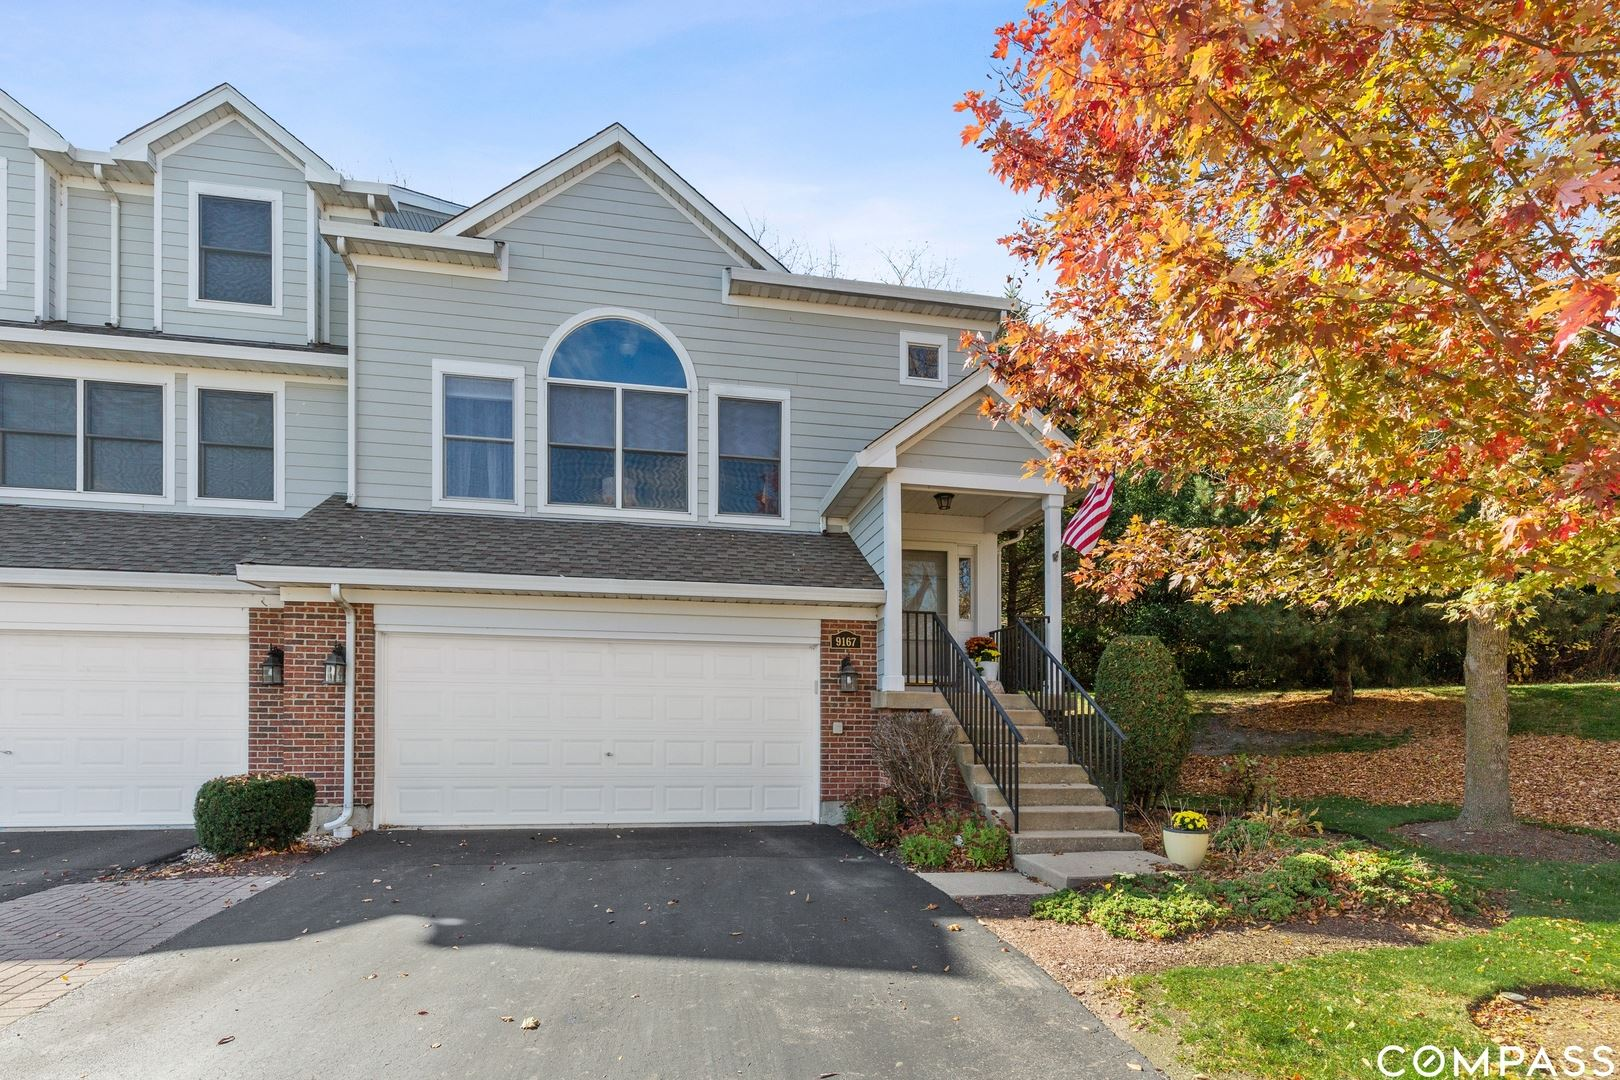 9167 FALCON GREENS Drive, Lakewood, IL 60014 - #: 10917309